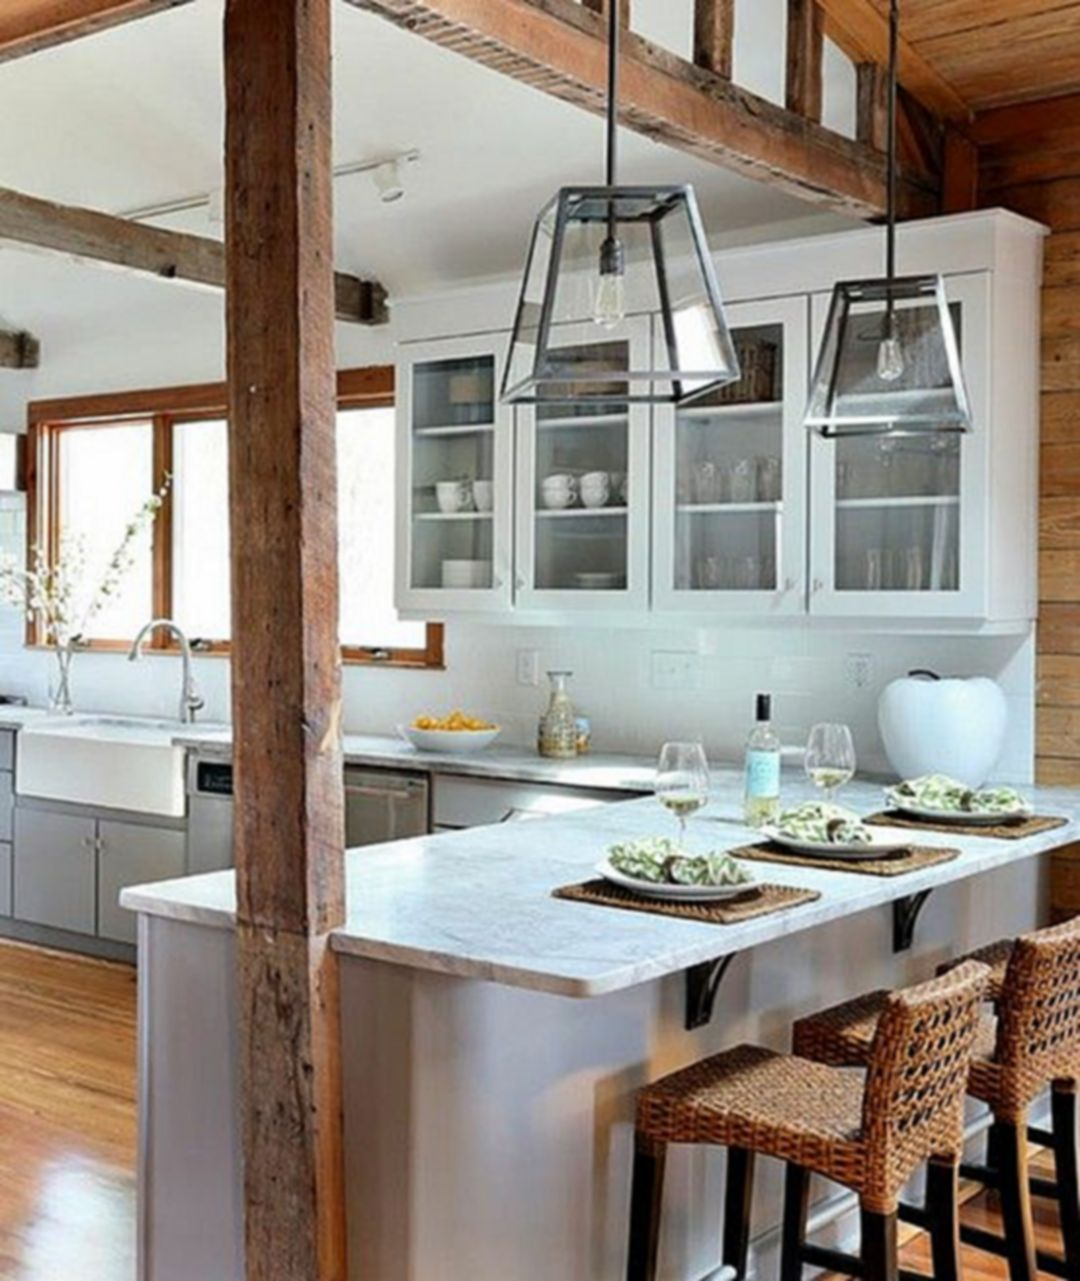 Enhanced Your Home Beautiful With Rustic Beach Decor Ideas 20